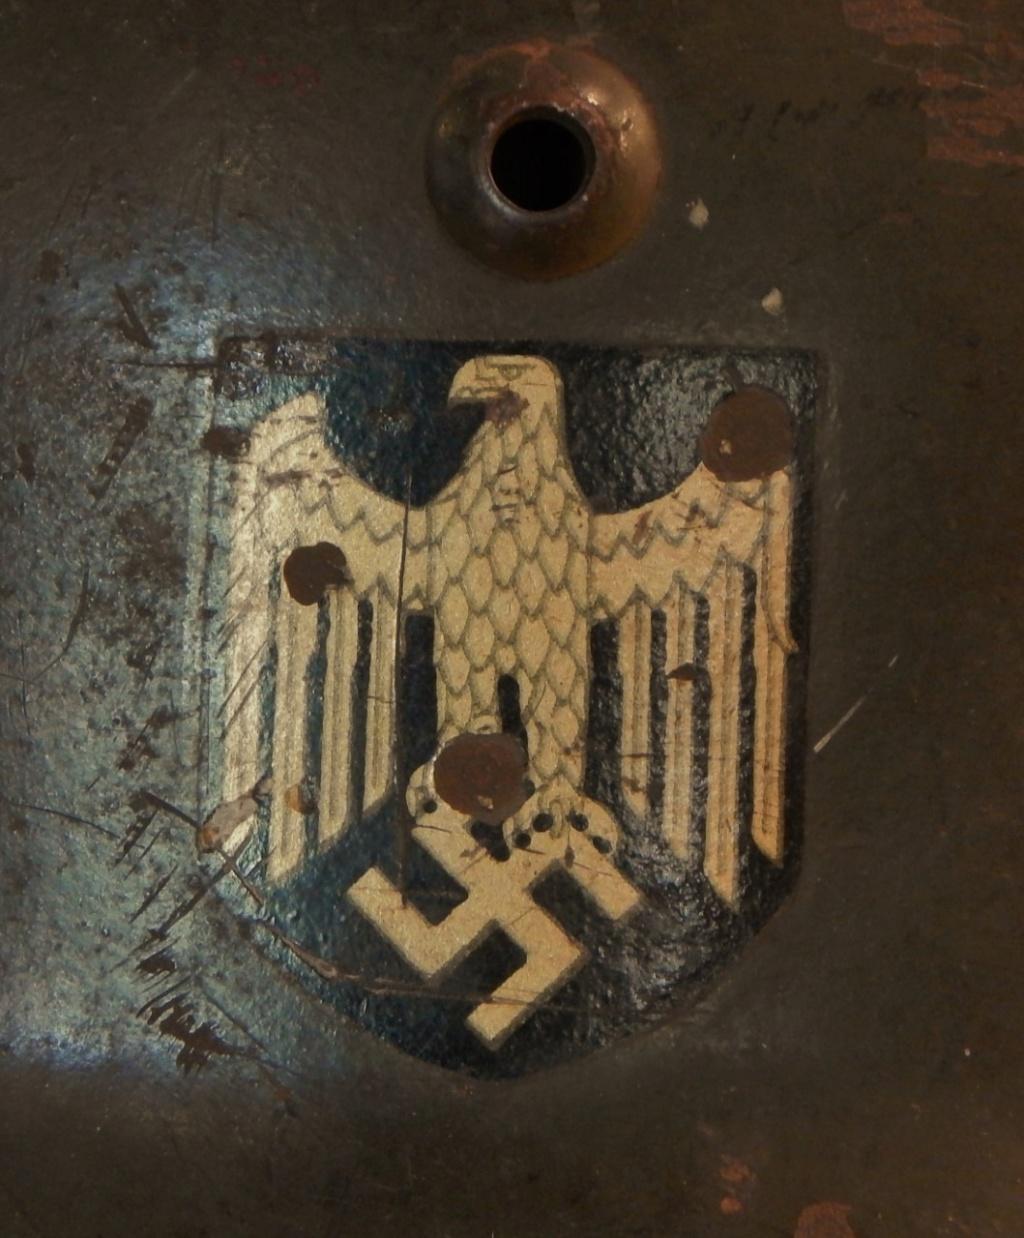 Casque Heer typique de la Wehrmacht - Page 3 Thumbn86